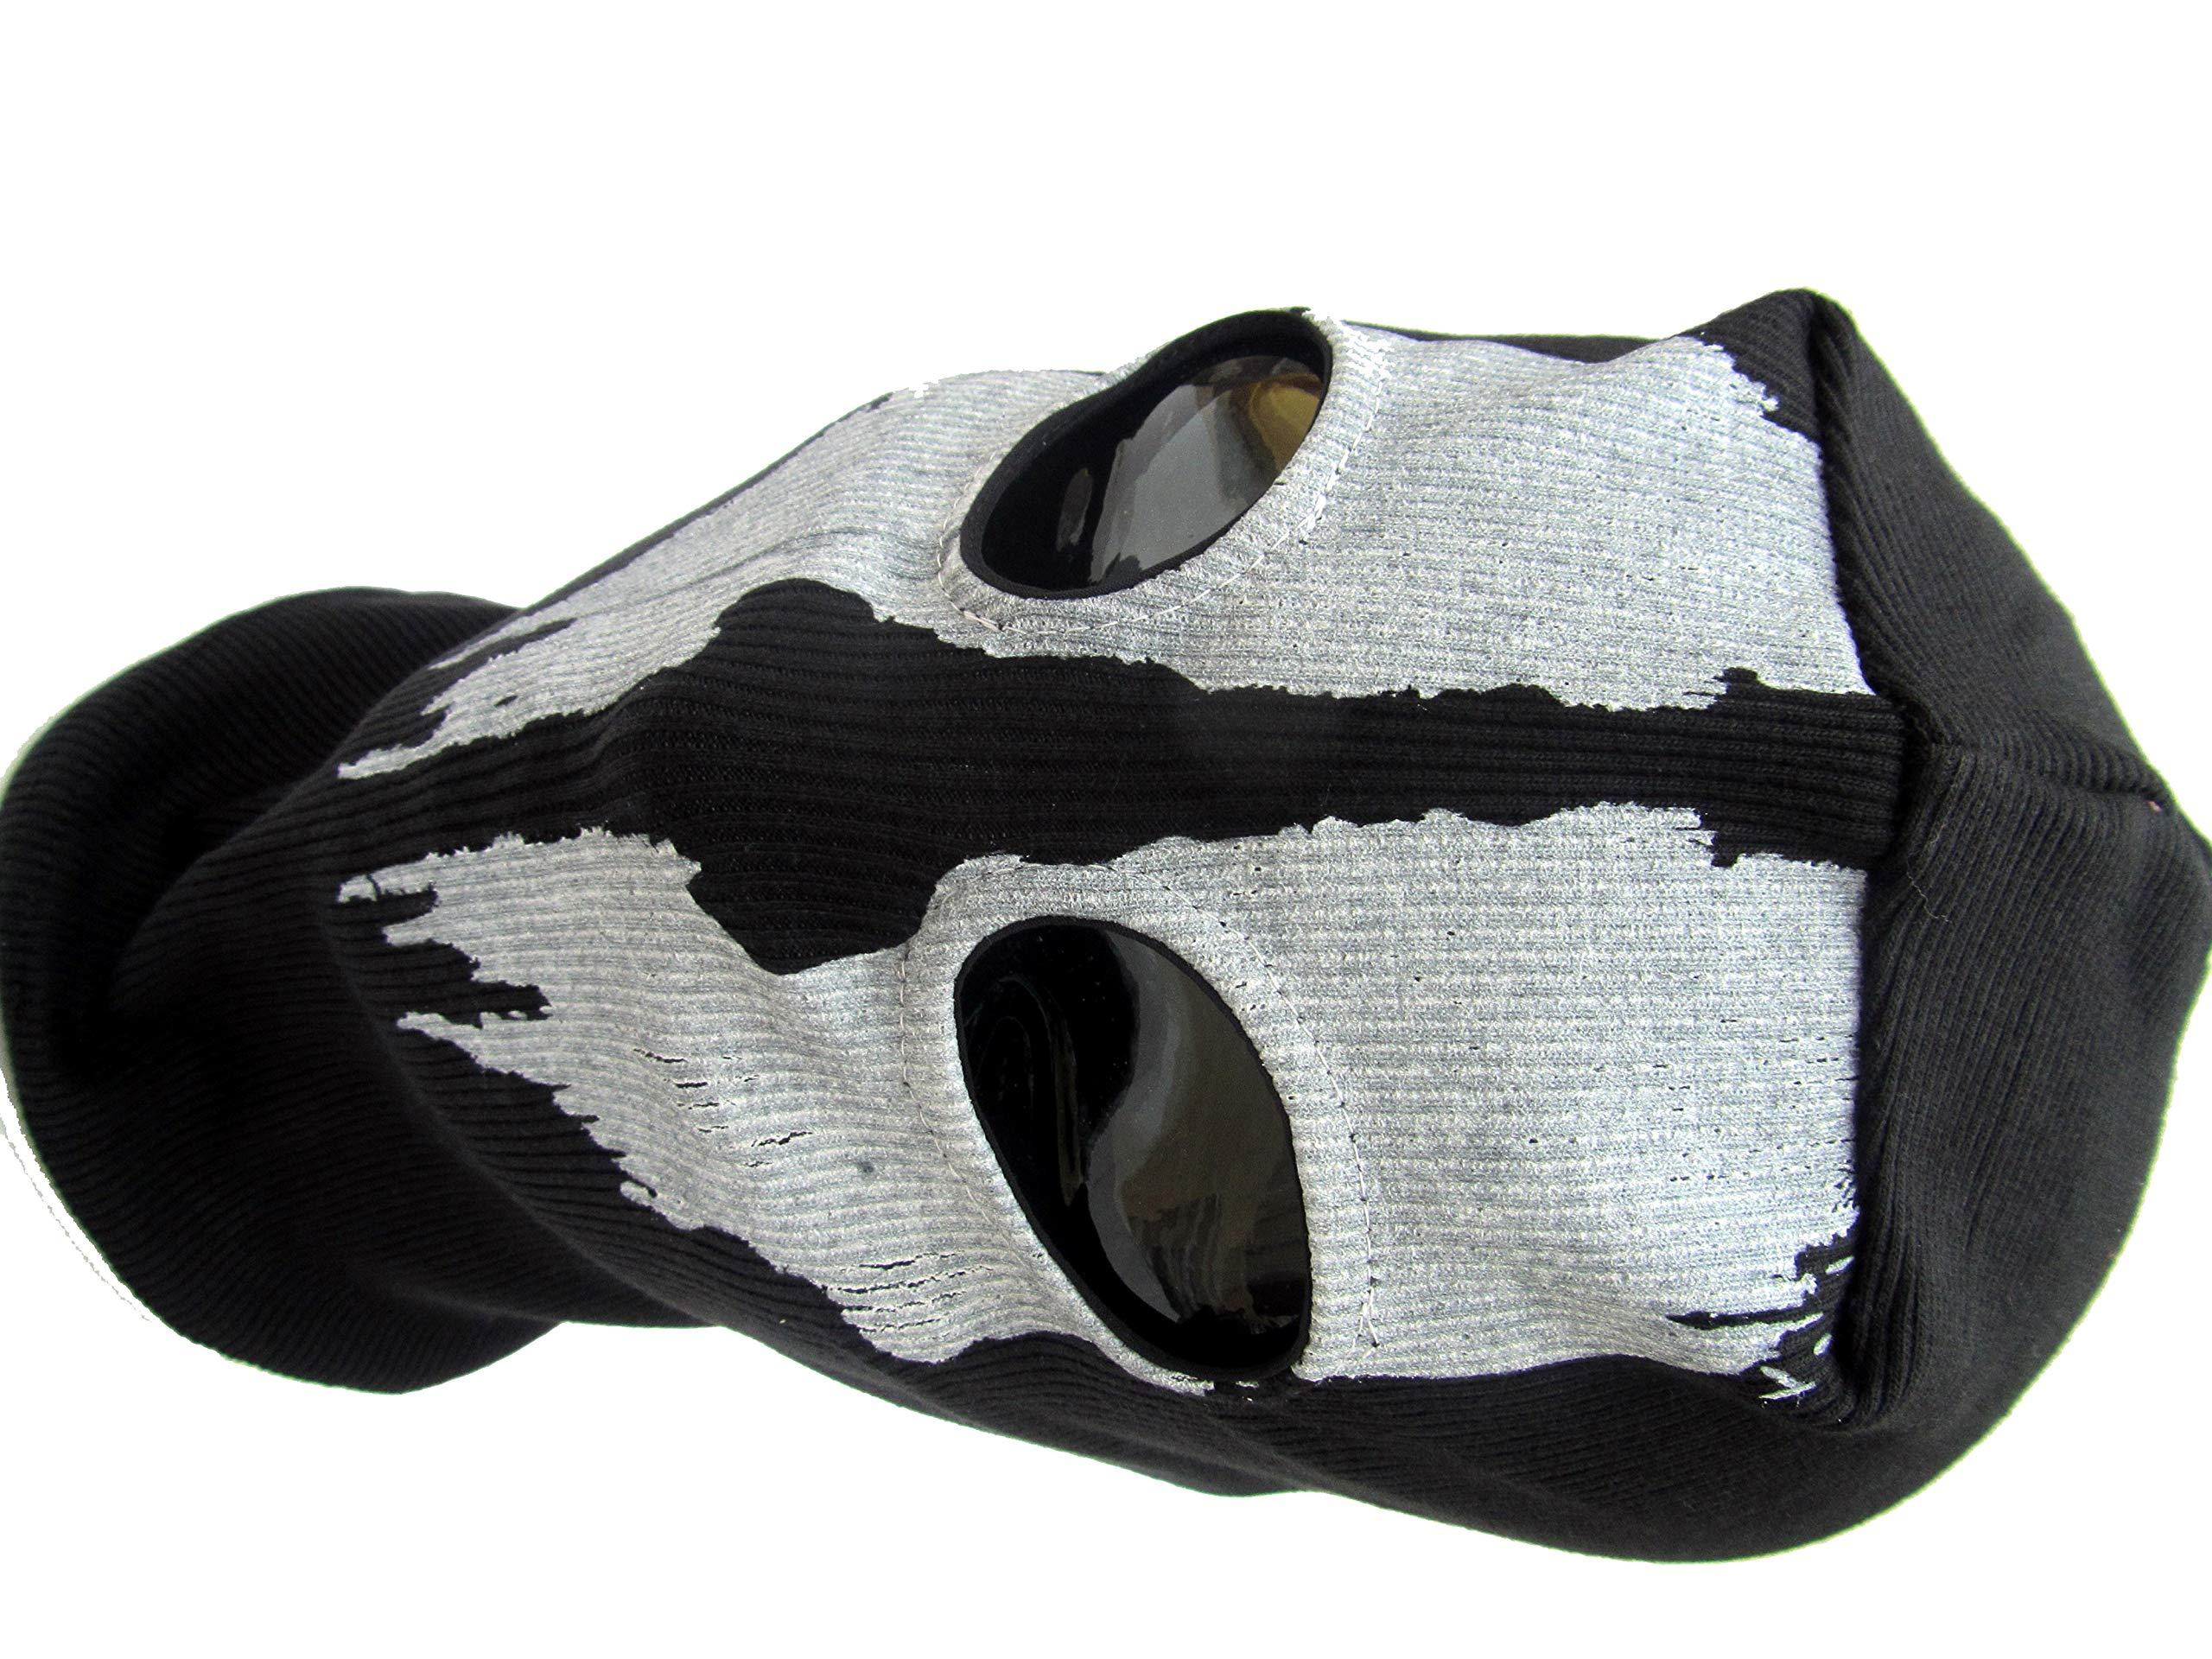 Takashi 2 Hole Balaclava Ghost Skull Face Mask Bike Motorcycle Helmet Hood Ski Sport Neck Face Mask Halloween Horror Ski Motorcycle Biker Scarf Skull Face Mask